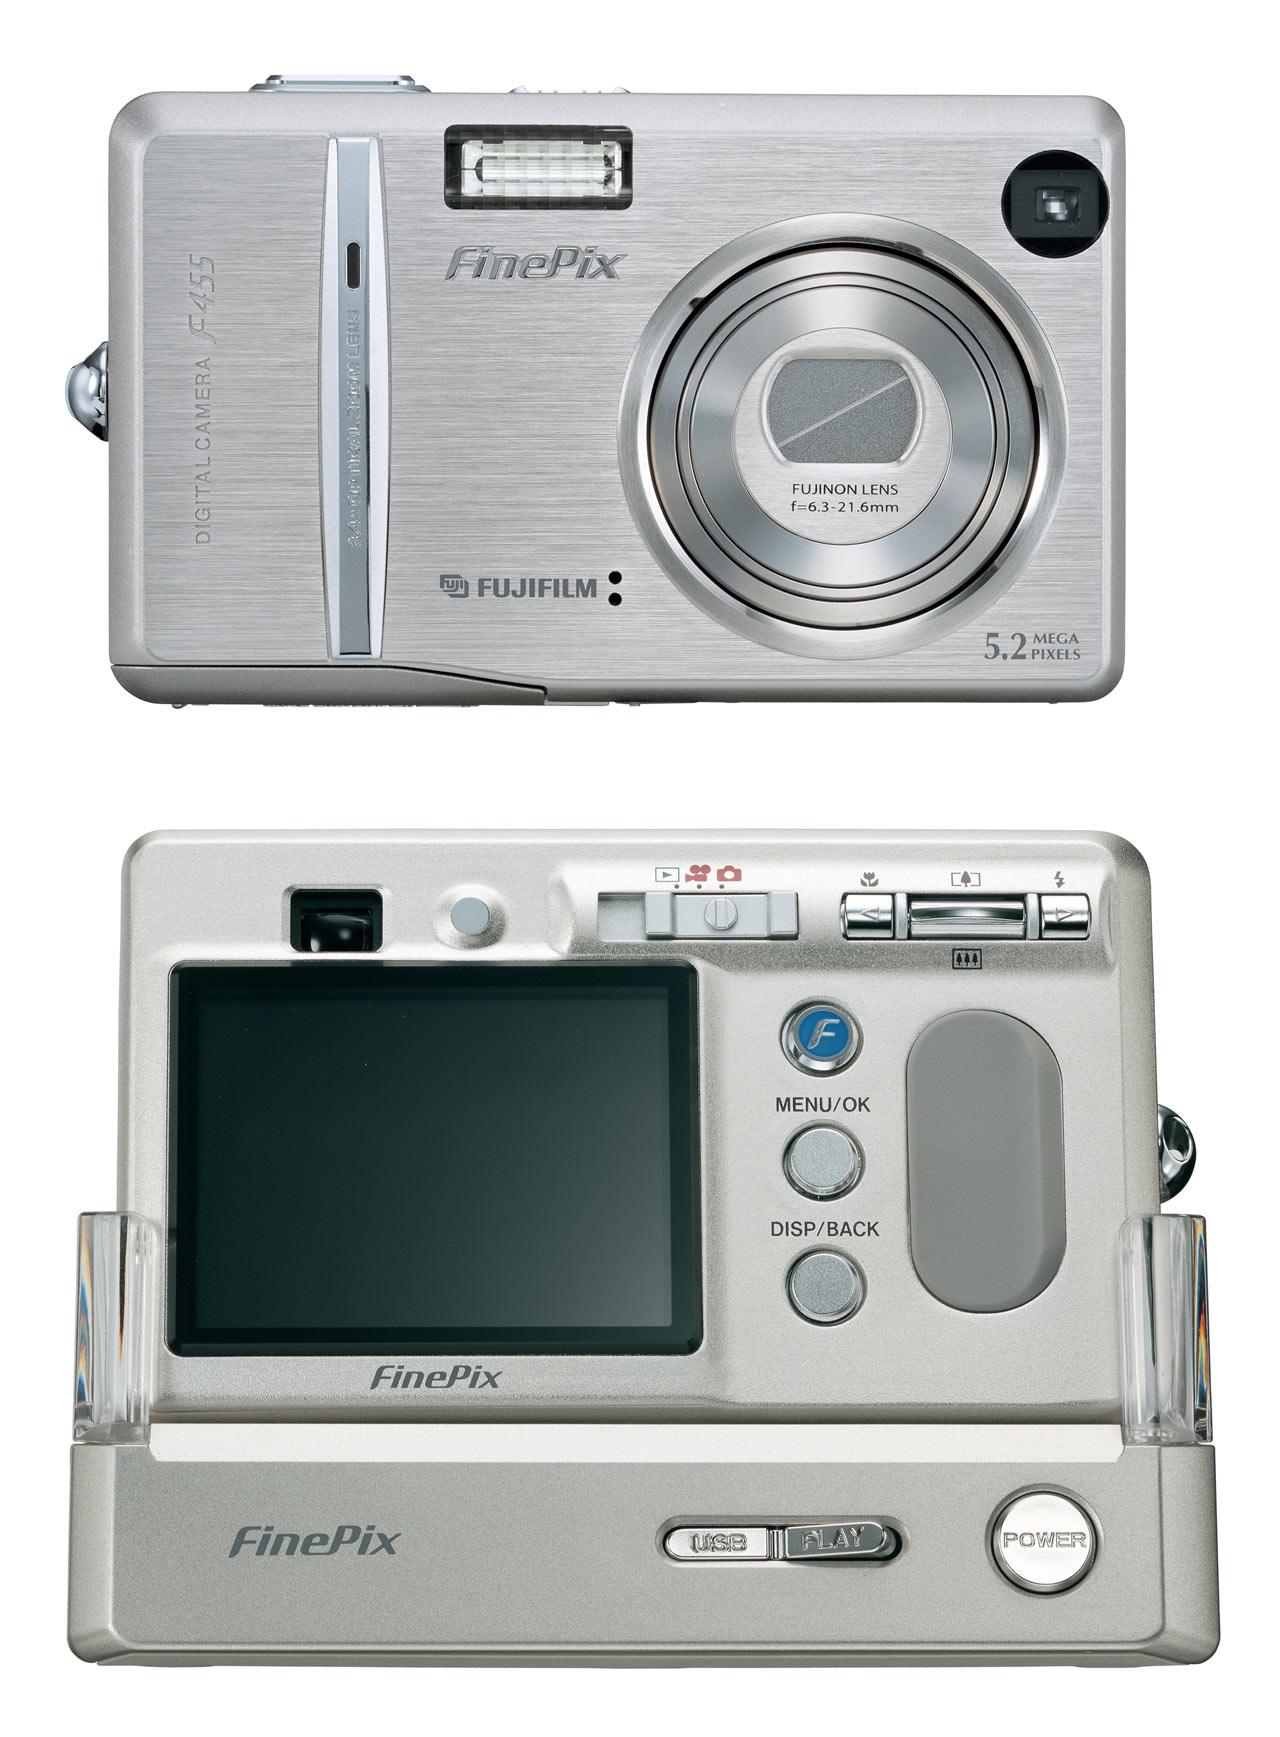 Fuji Finepix F455 Zoom Digital Photography Review